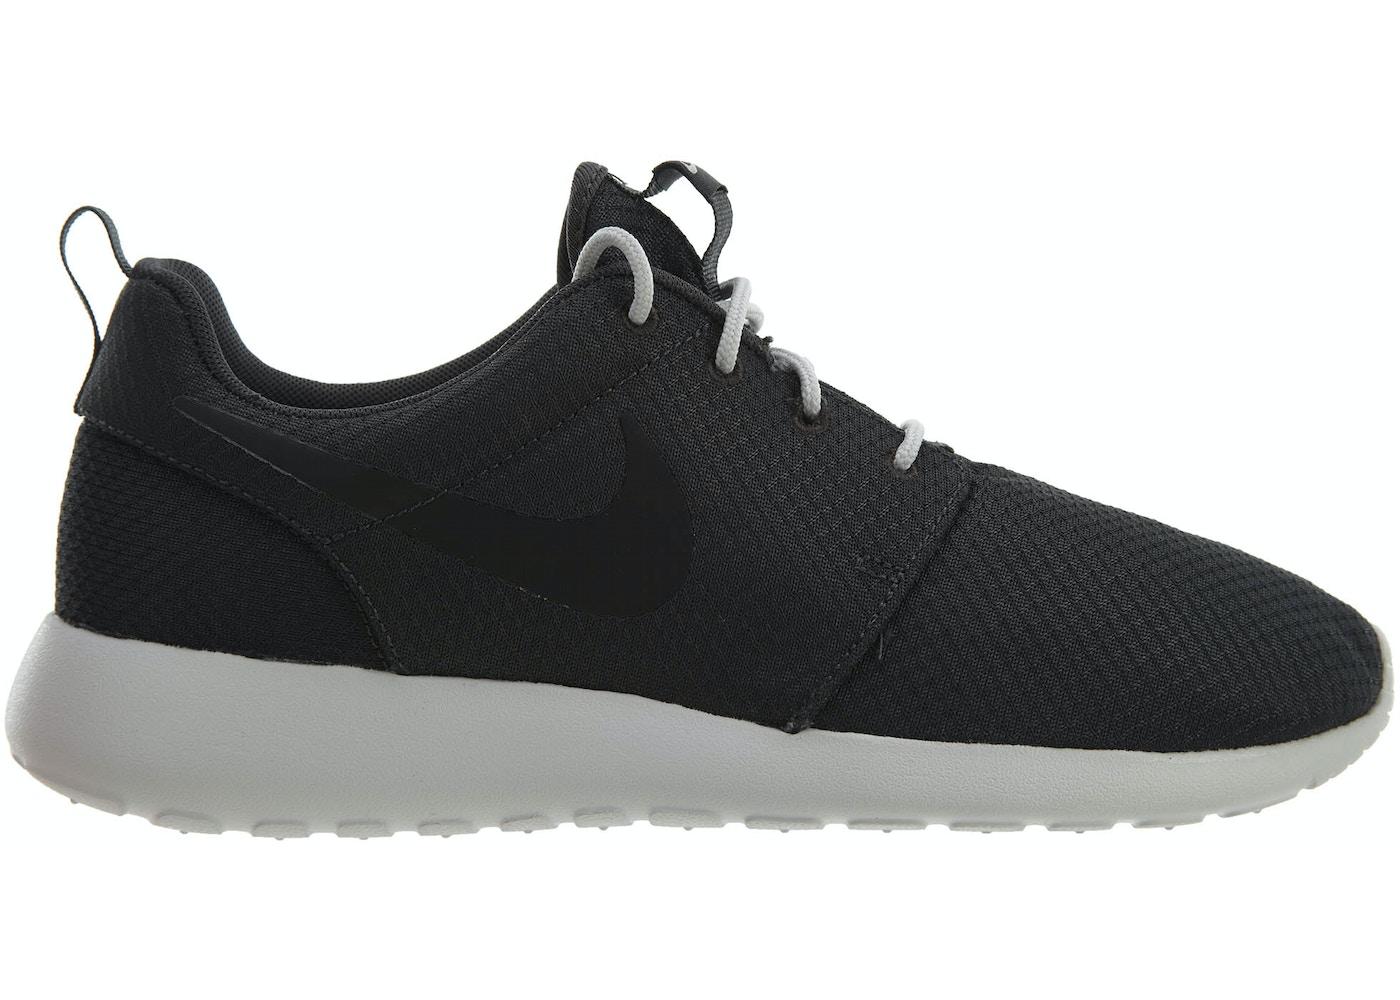 save off 82416 195da Nike Roshe One Anthracite Black-Vast Grey